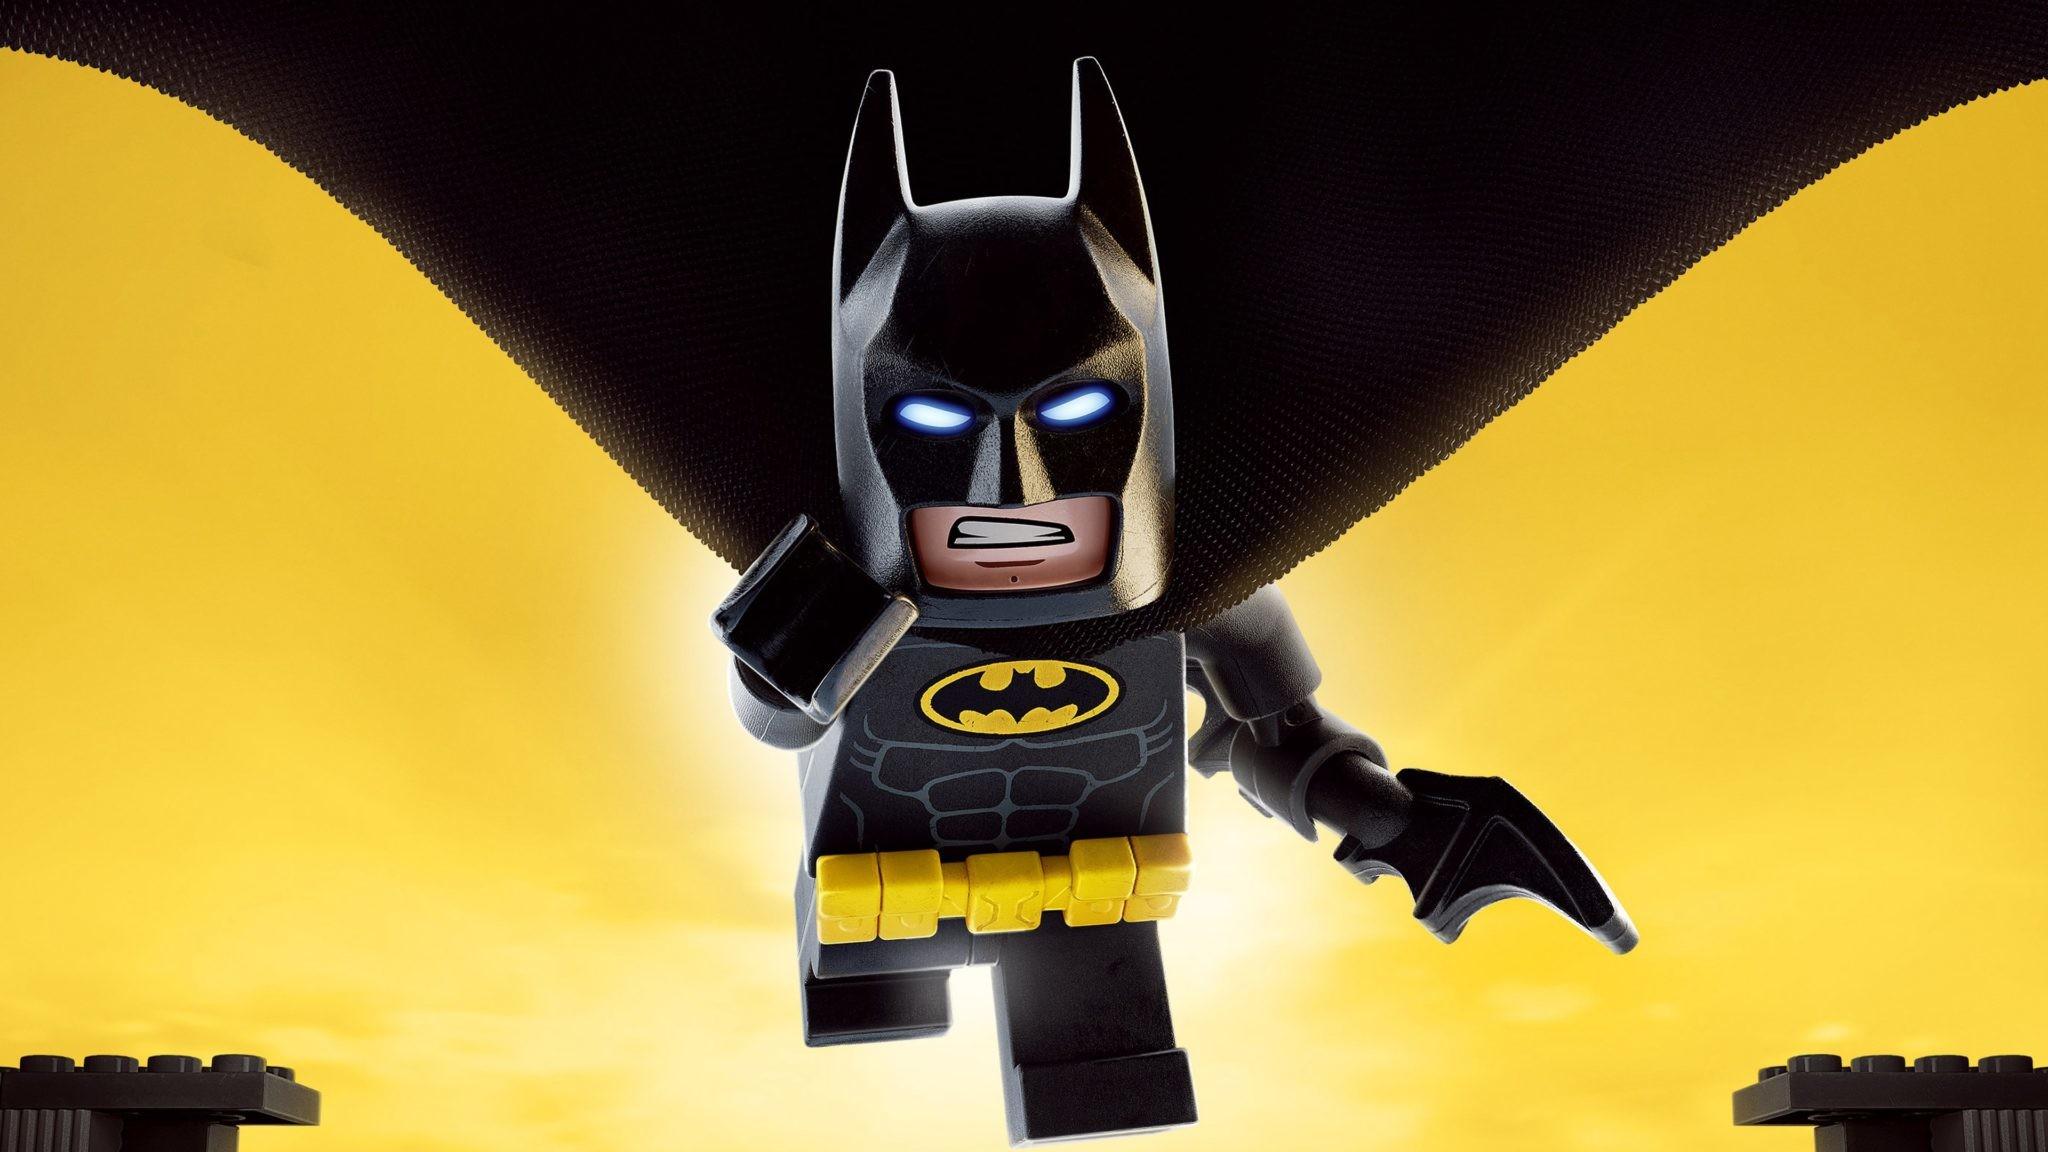 The Lego Batman Movie Wallpapers